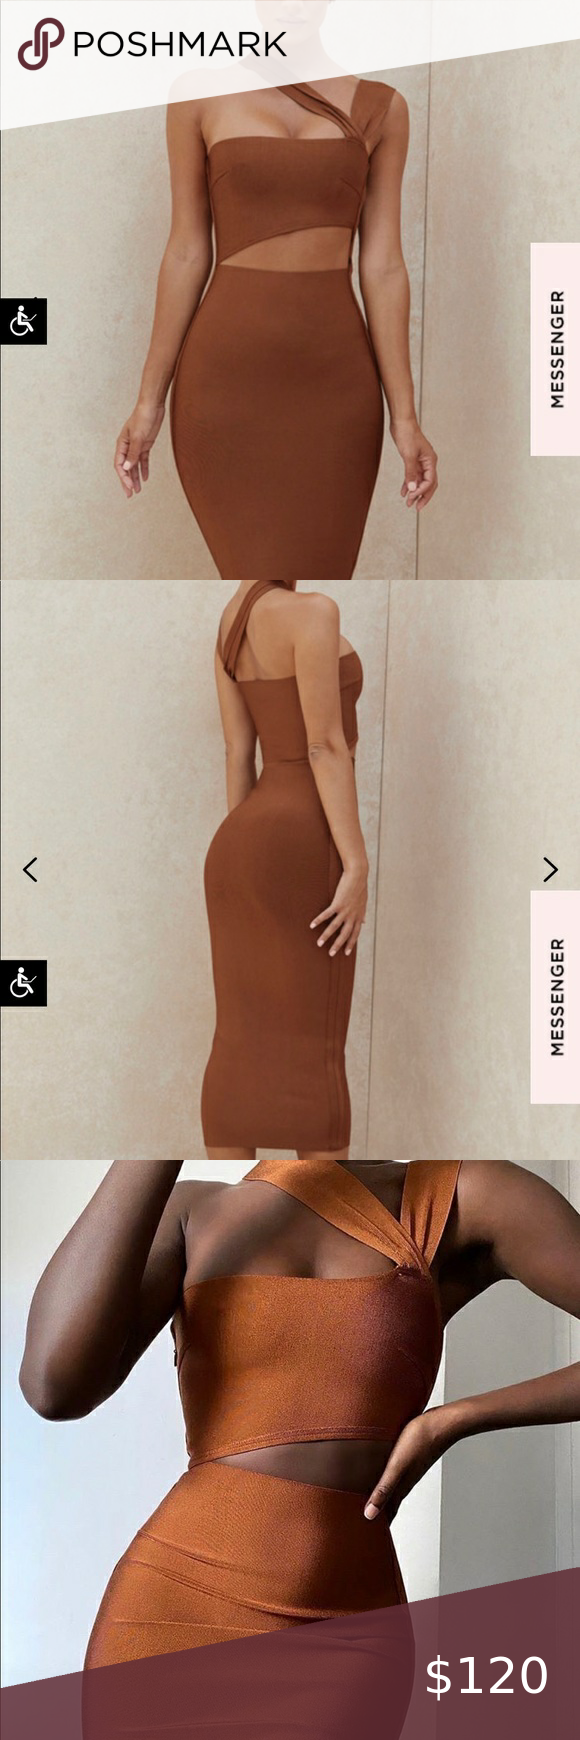 House Of Cb Aina Dress Like New Clothes Design Dresses House Of Cb Dresses [ 1740 x 580 Pixel ]